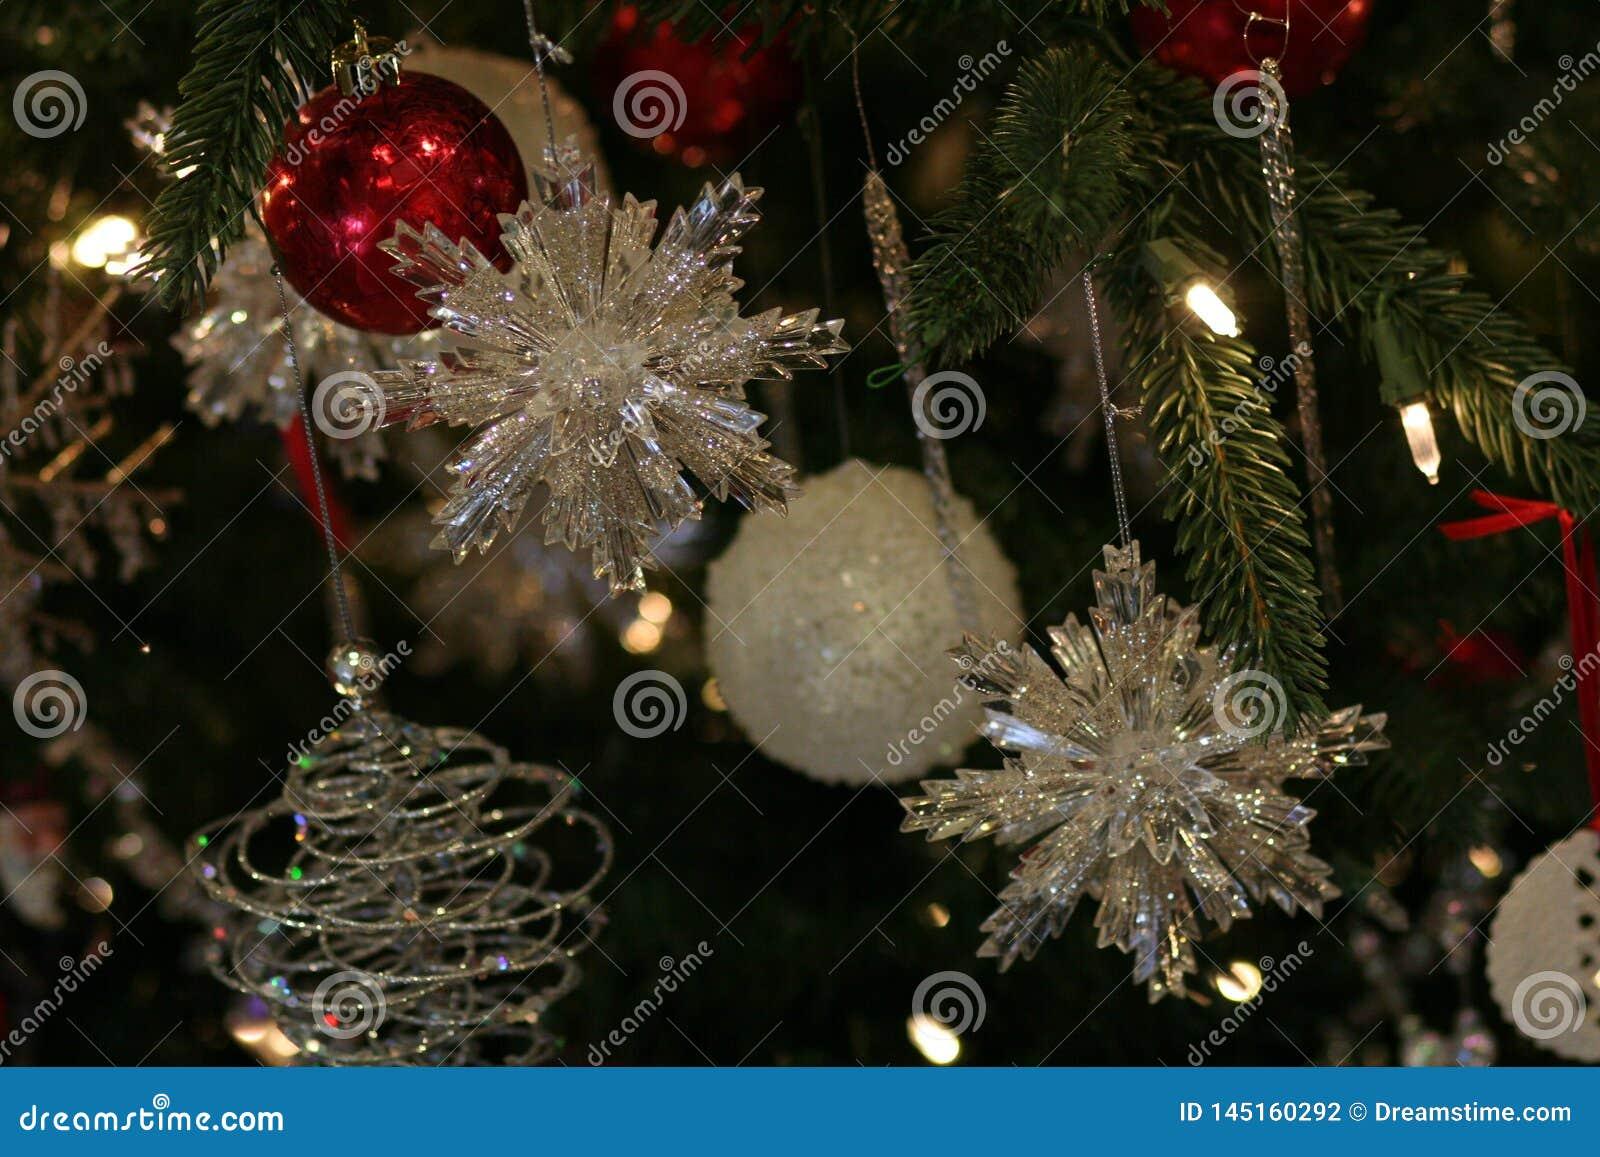 Sparkling crystal snowflake ornaments